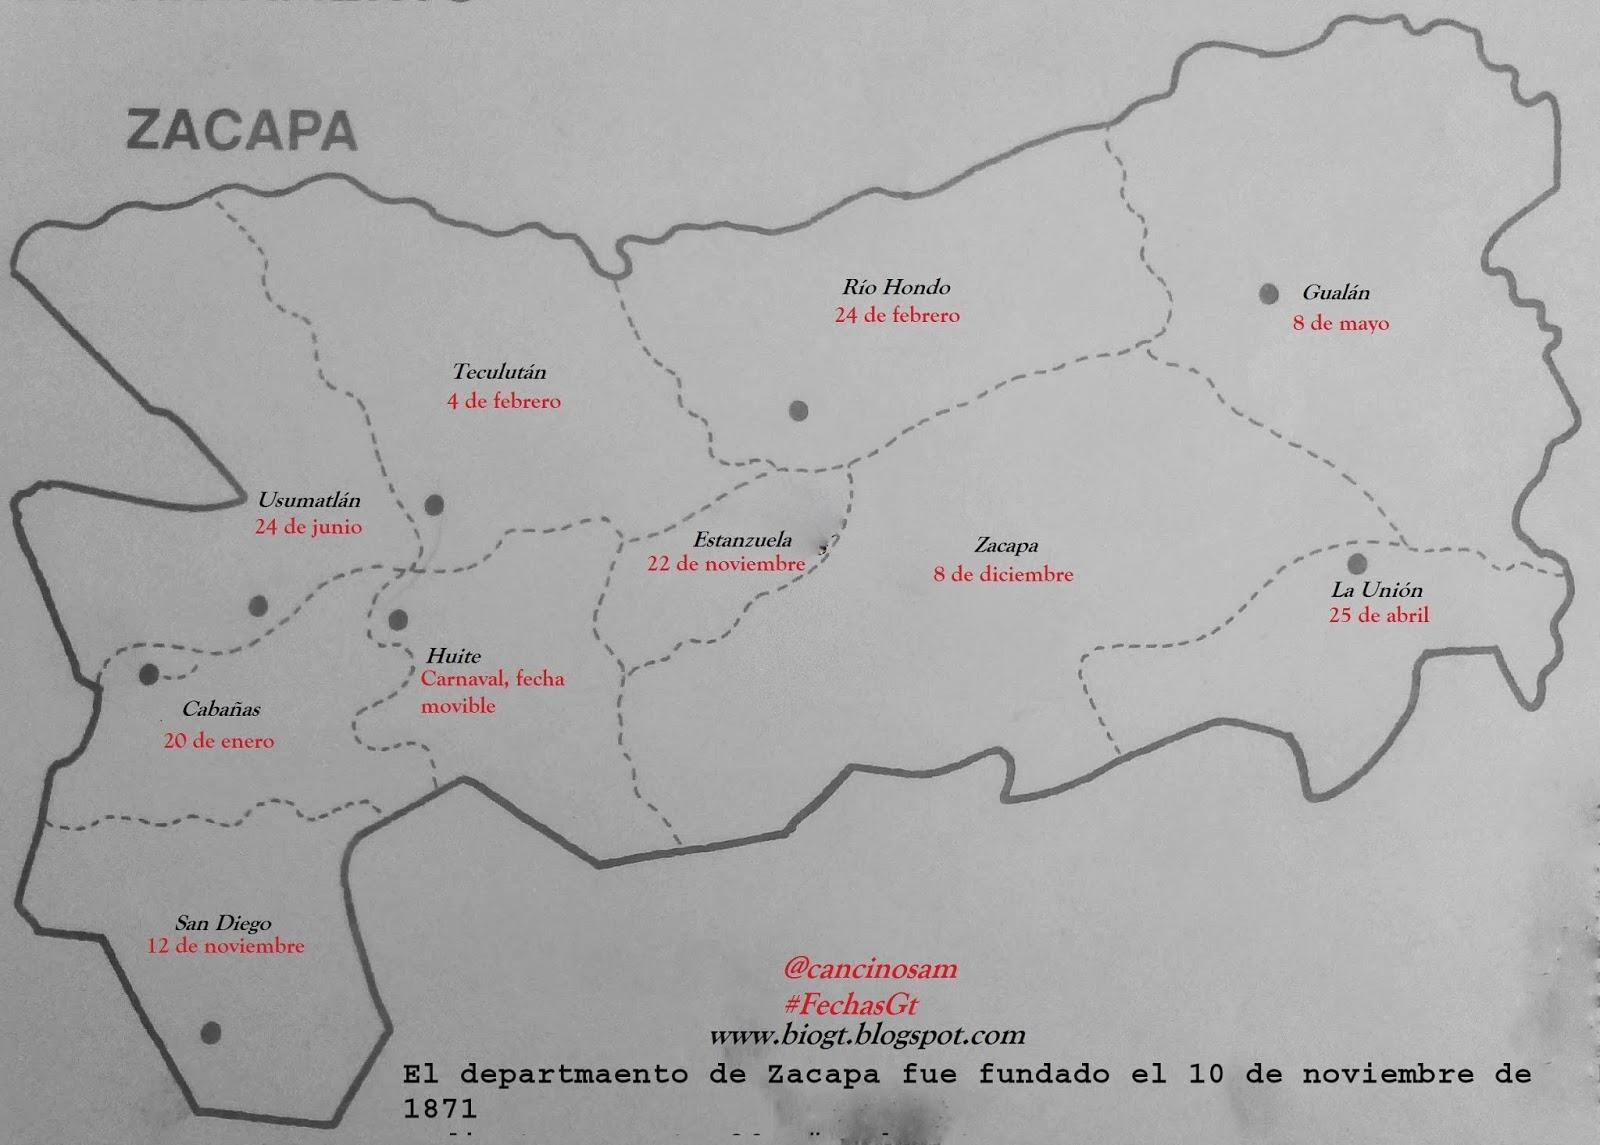 MADE IN GUATEMALA FERIAS DE ZACAPA